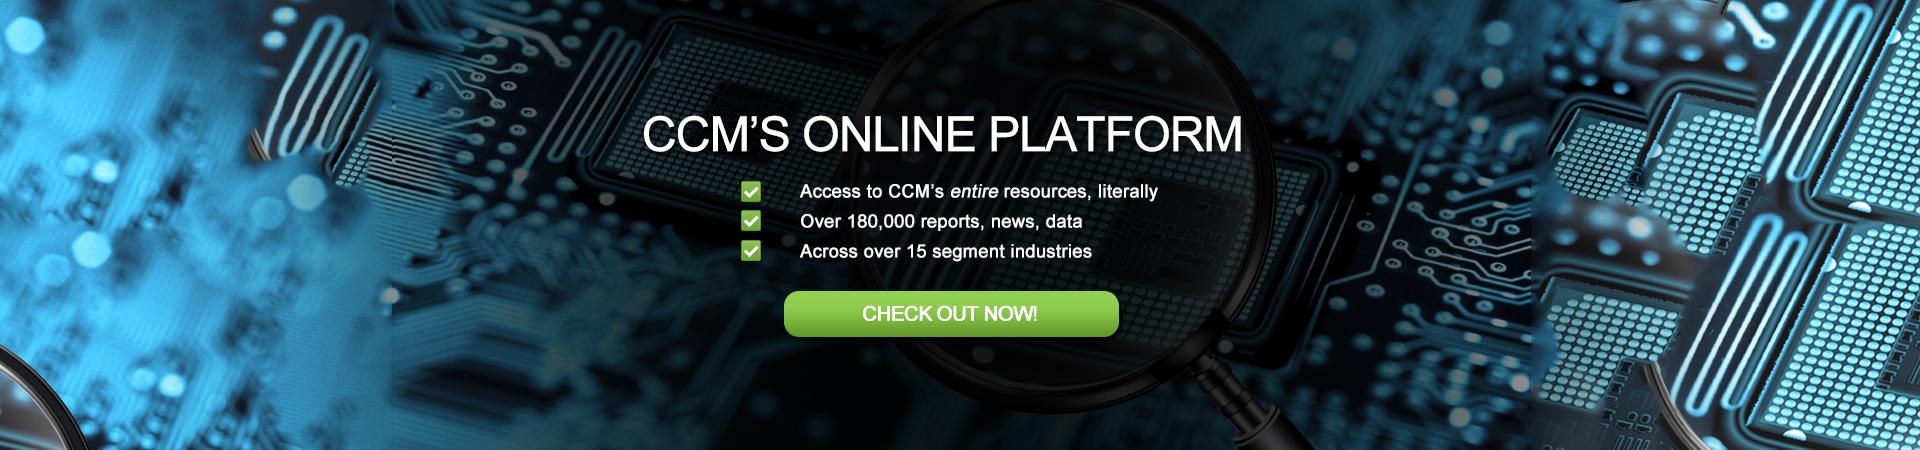 Online Platform Banner